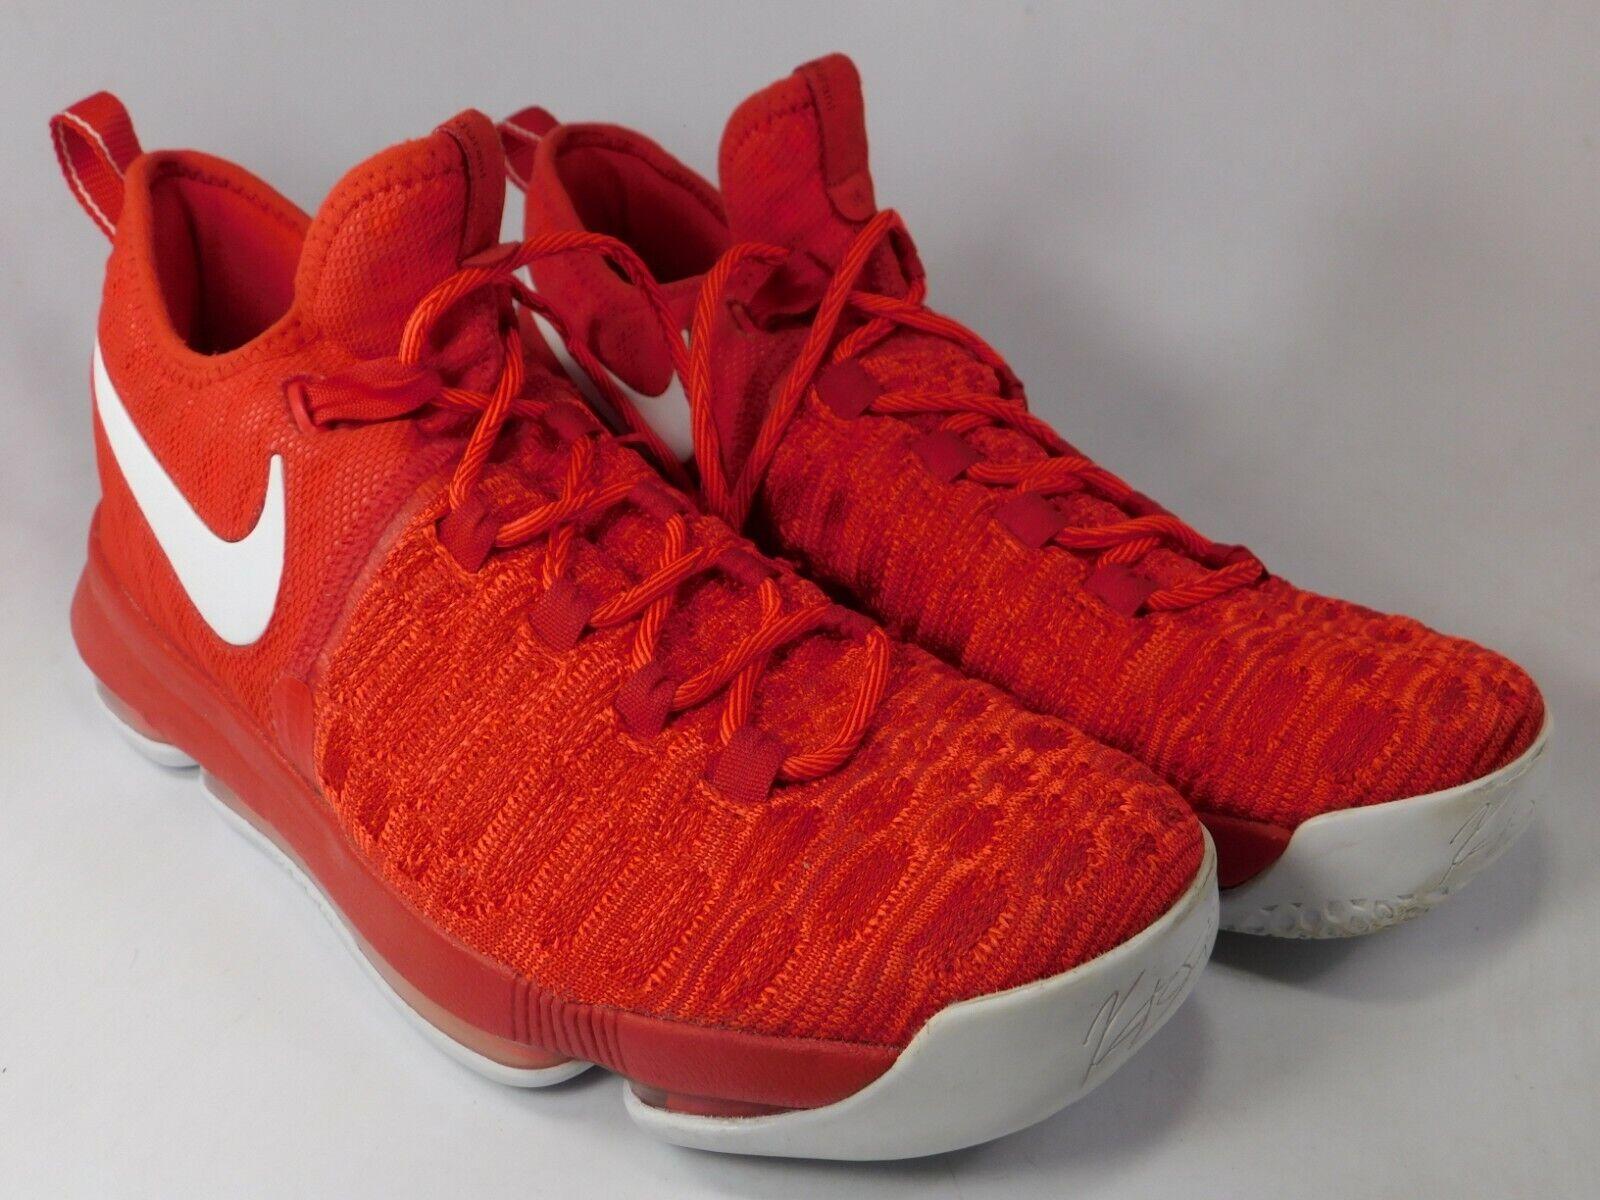 Nike Zoom KD 9 IX Size US 10.5 M (D) EU 44.5 Men's Basketball shoes Red 843392